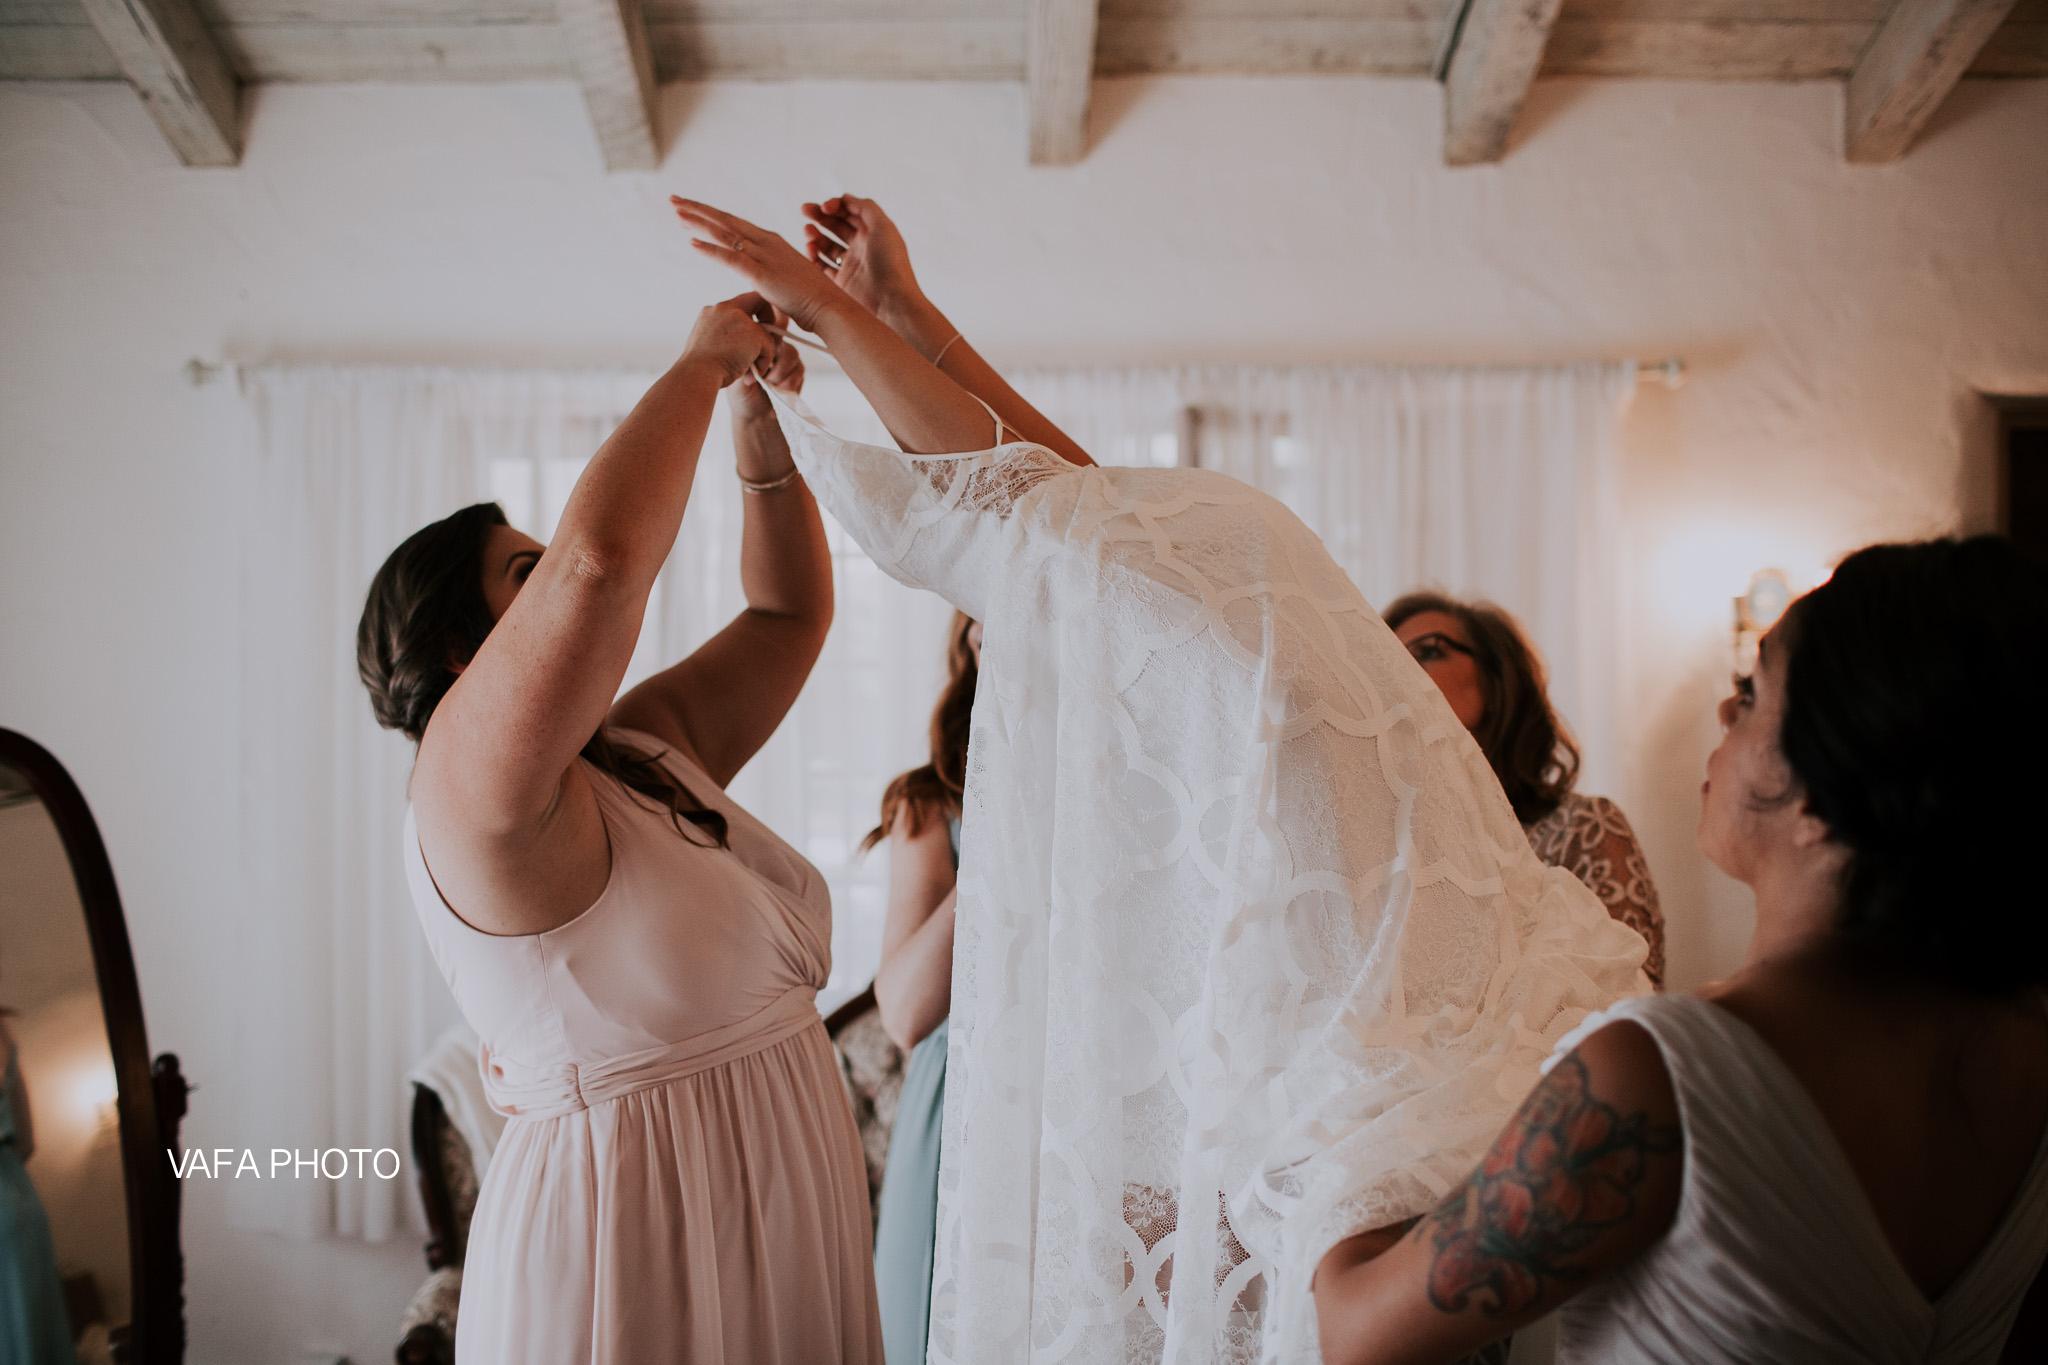 Leo-Carrillo-Ranch-Wedding-Lauren-Mike-Vafa-Photo-132.jpg